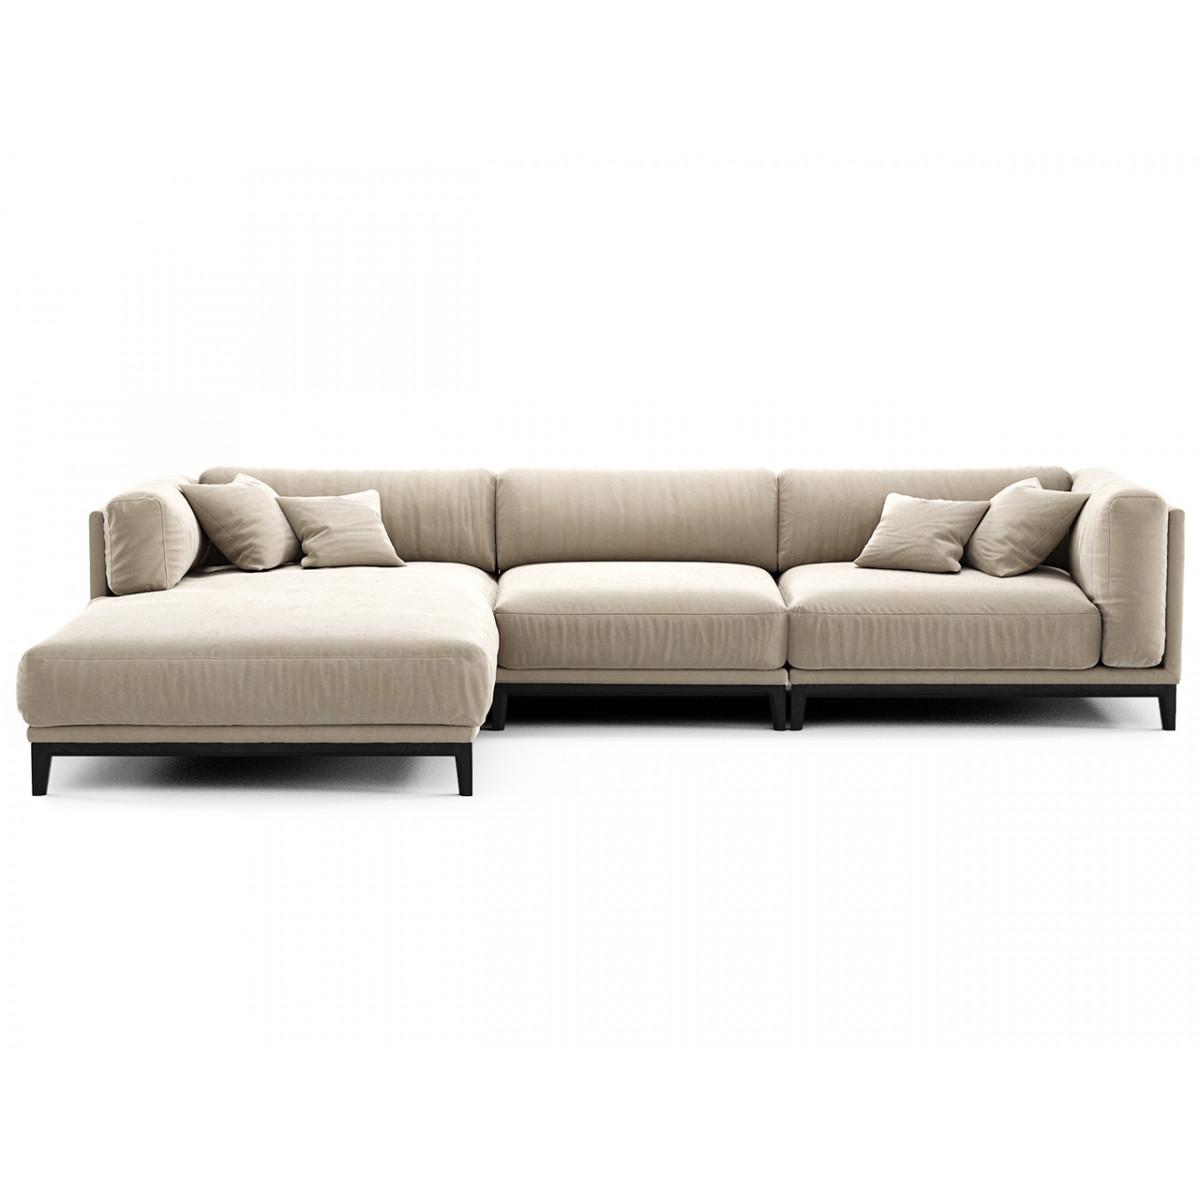 The idea диван case серый 135274/3